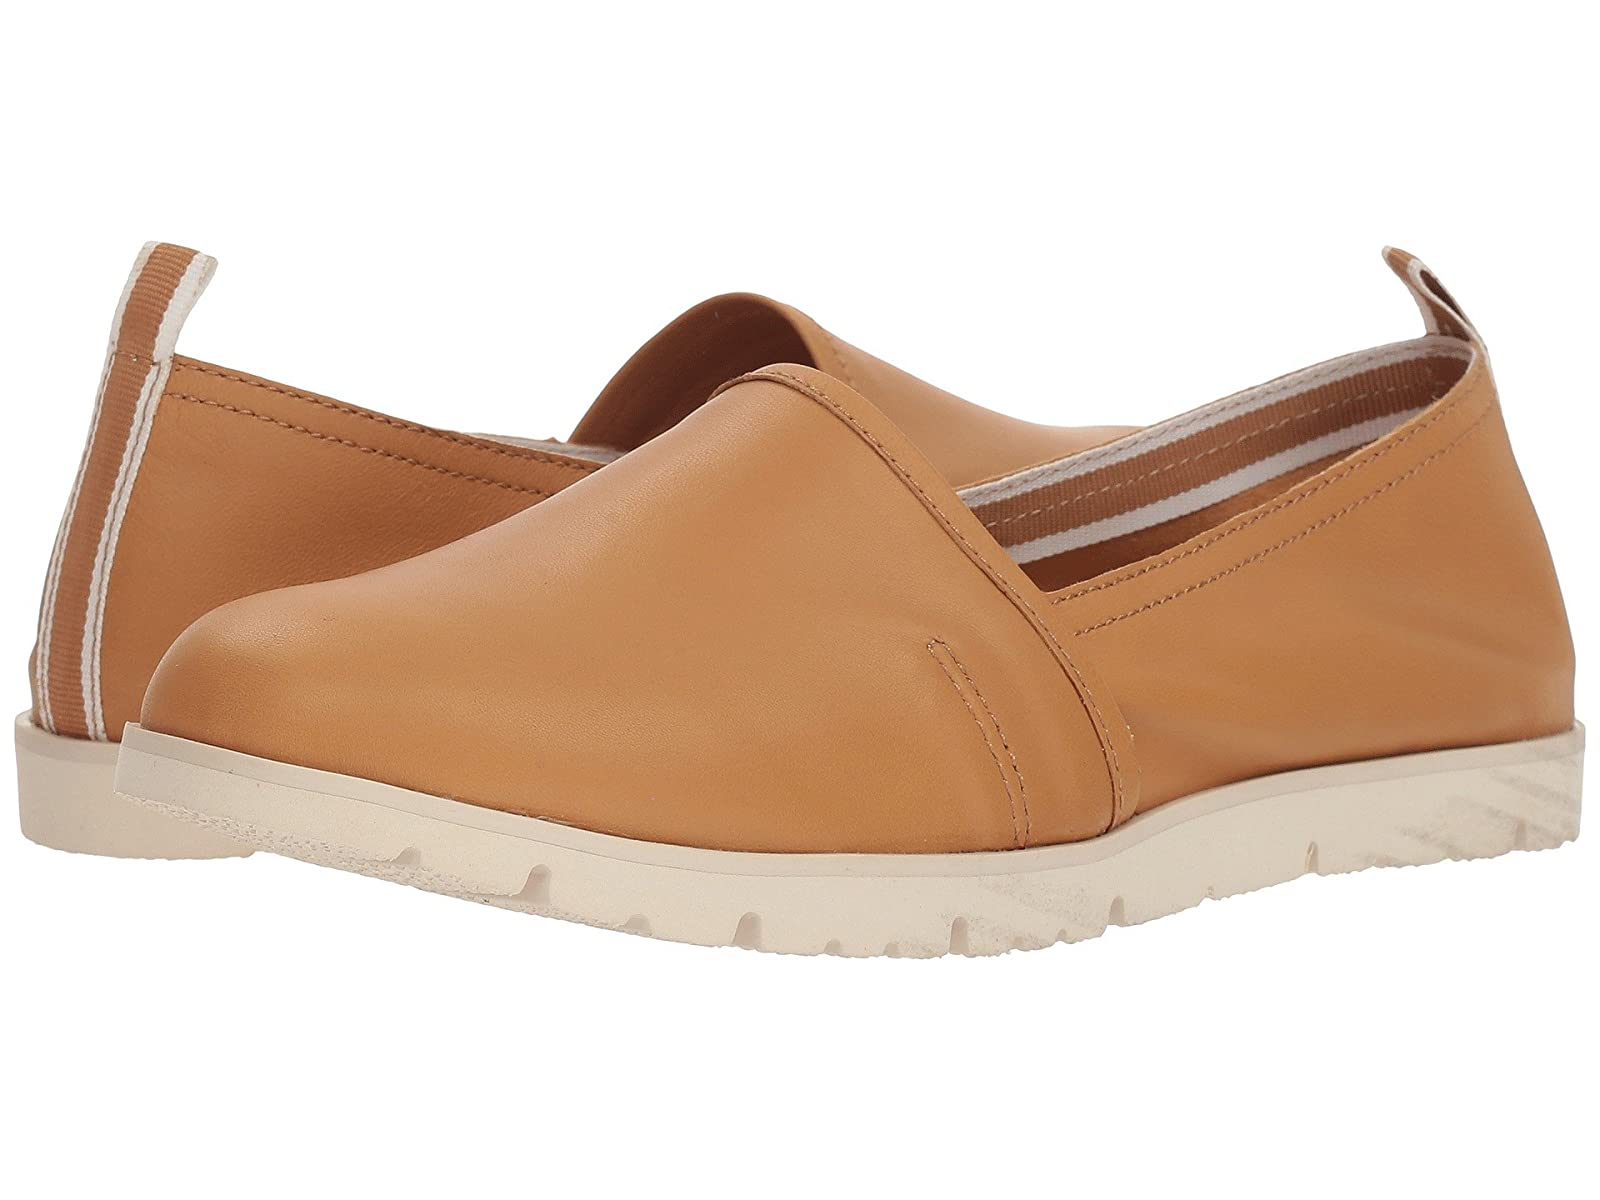 Korks LillisCheap and distinctive eye-catching shoes